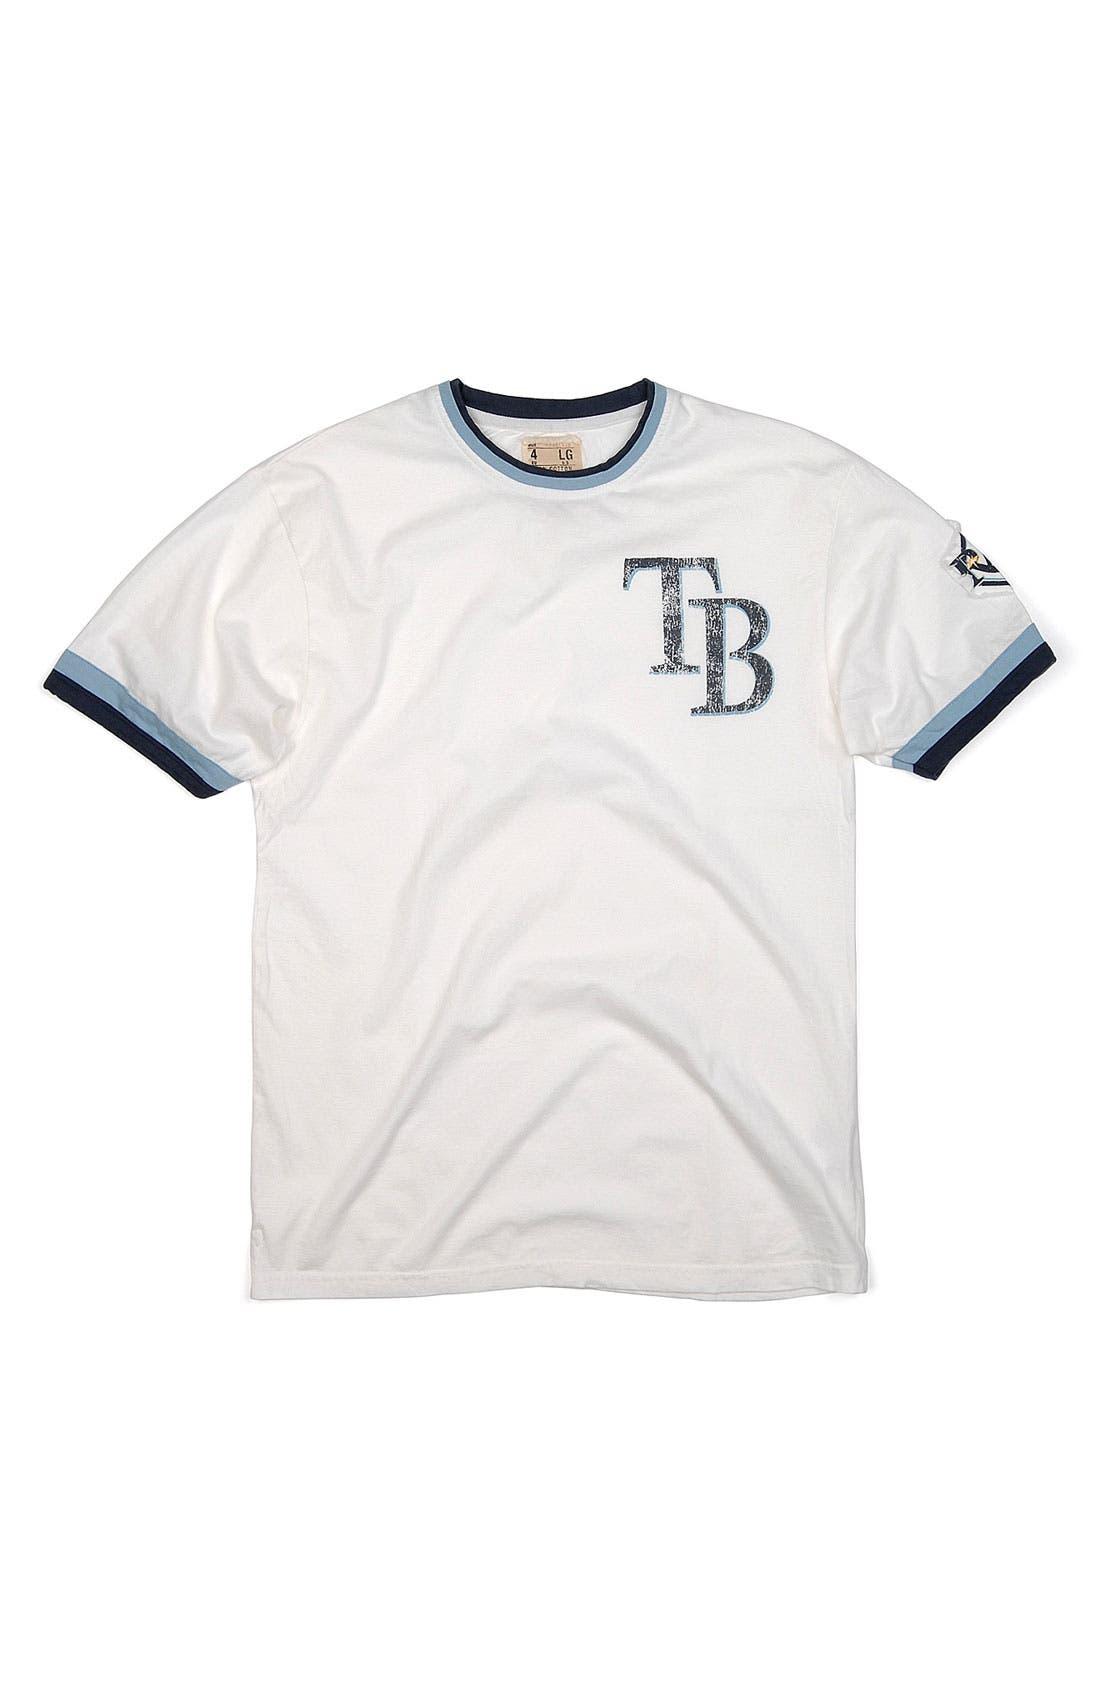 Alternate Image 1 Selected - Red Jacket 'Tampa Bay Rays' Trim Fit Ringer T-Shirt (Men)